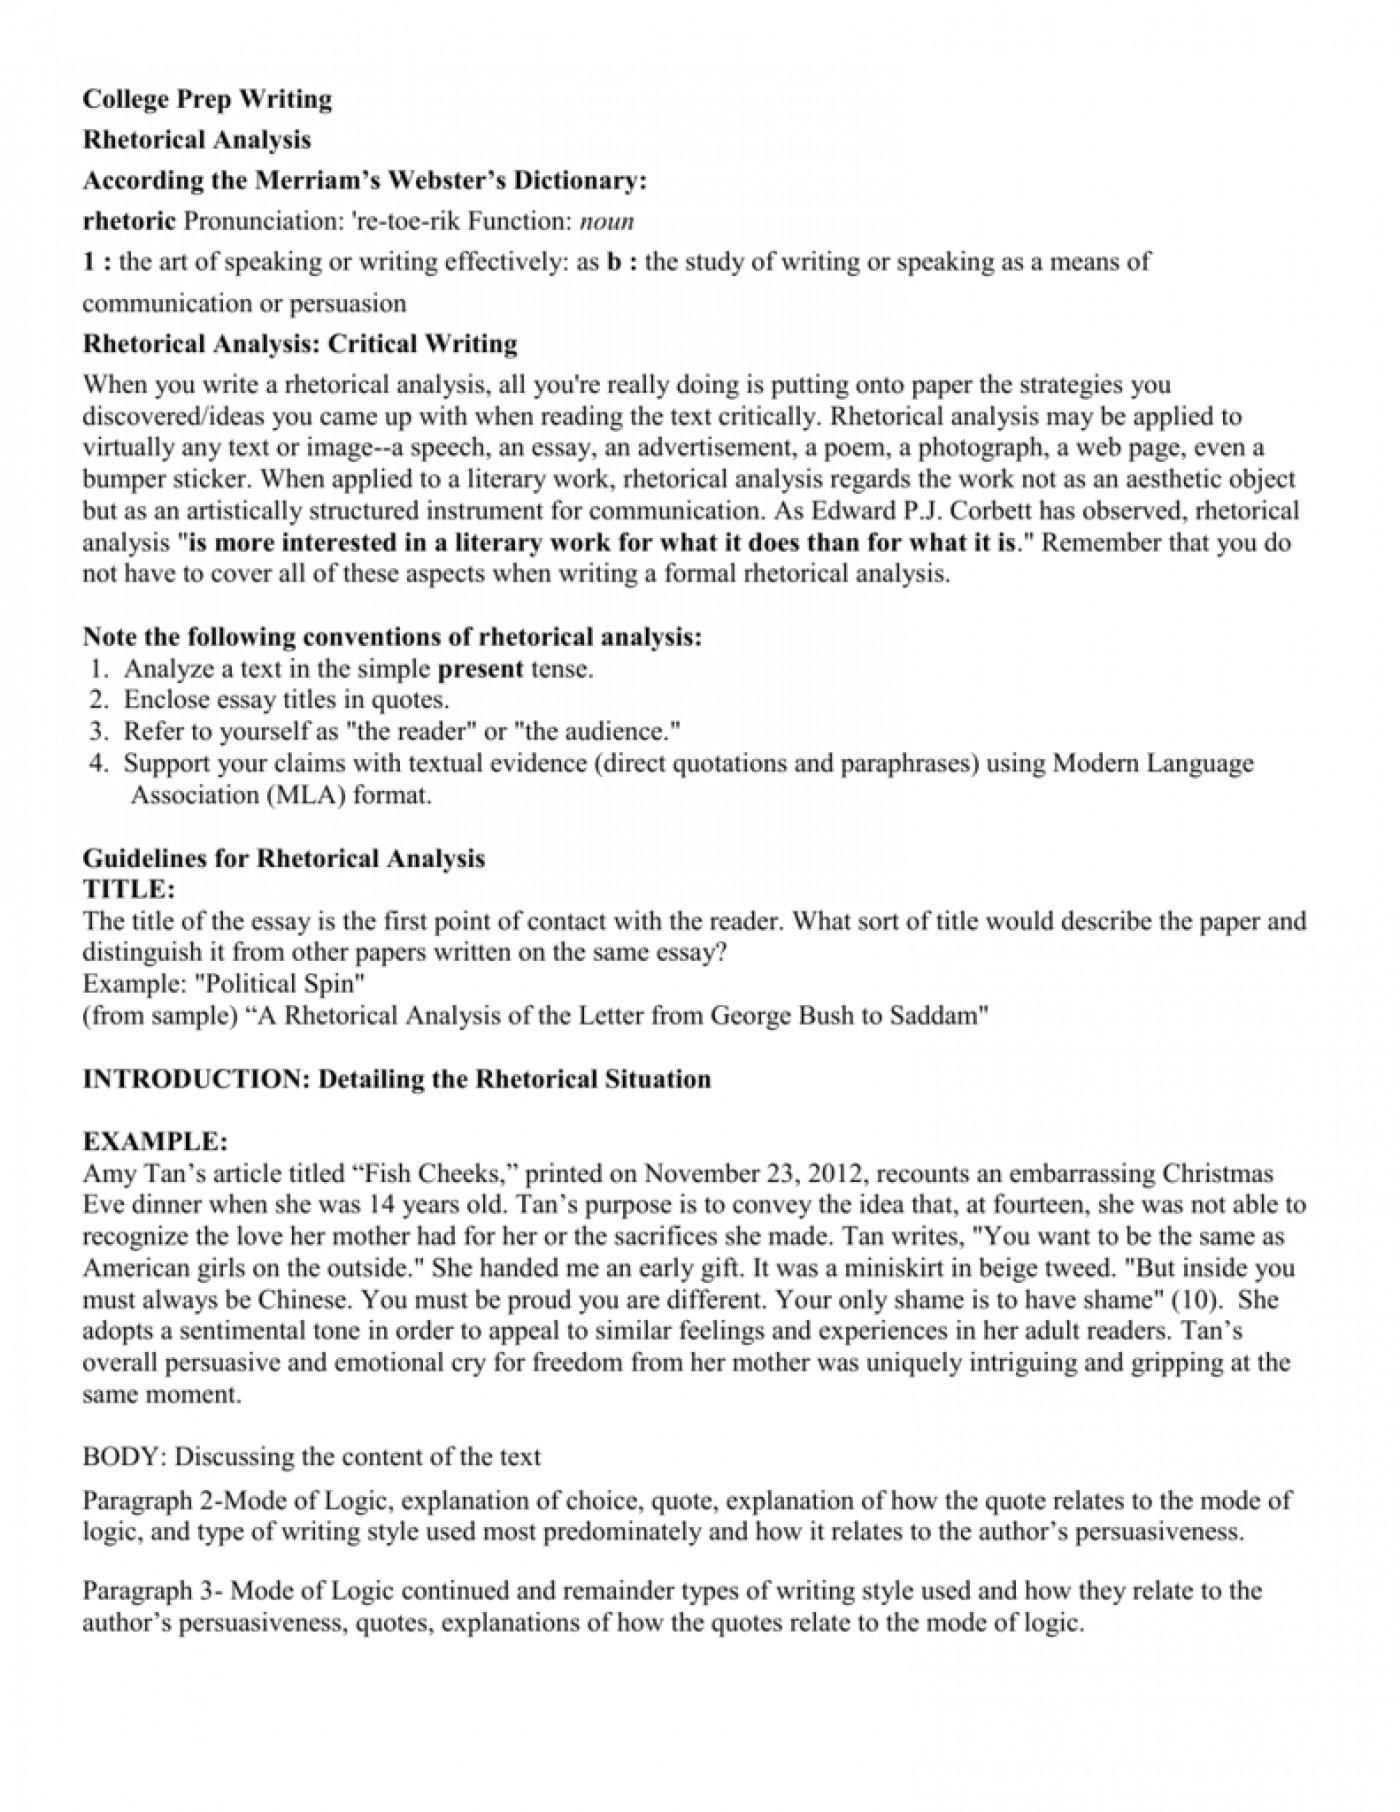 Drug testing essays